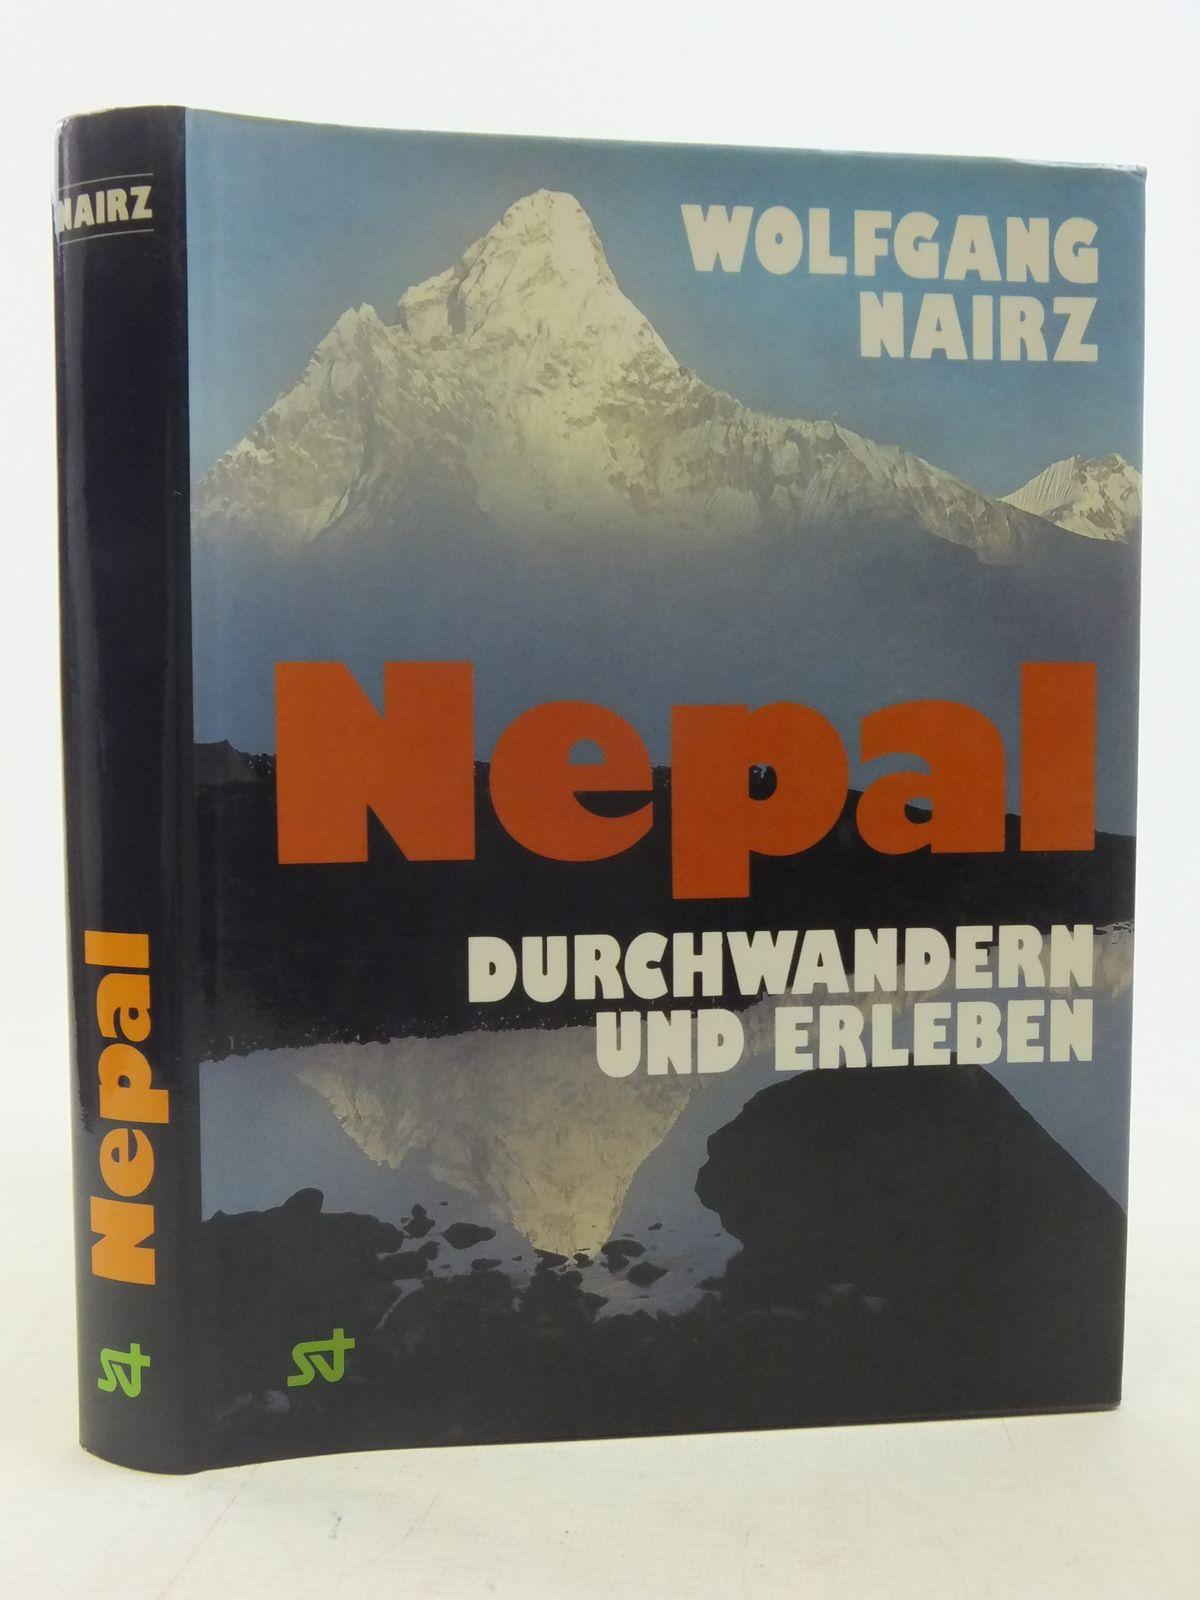 Photo of NEPAL DURCHWANDERN UND ERLEBEN written by Nairz, Wolfgang published by Steiger Verlag Innsbruck (STOCK CODE: 1606242)  for sale by Stella & Rose's Books